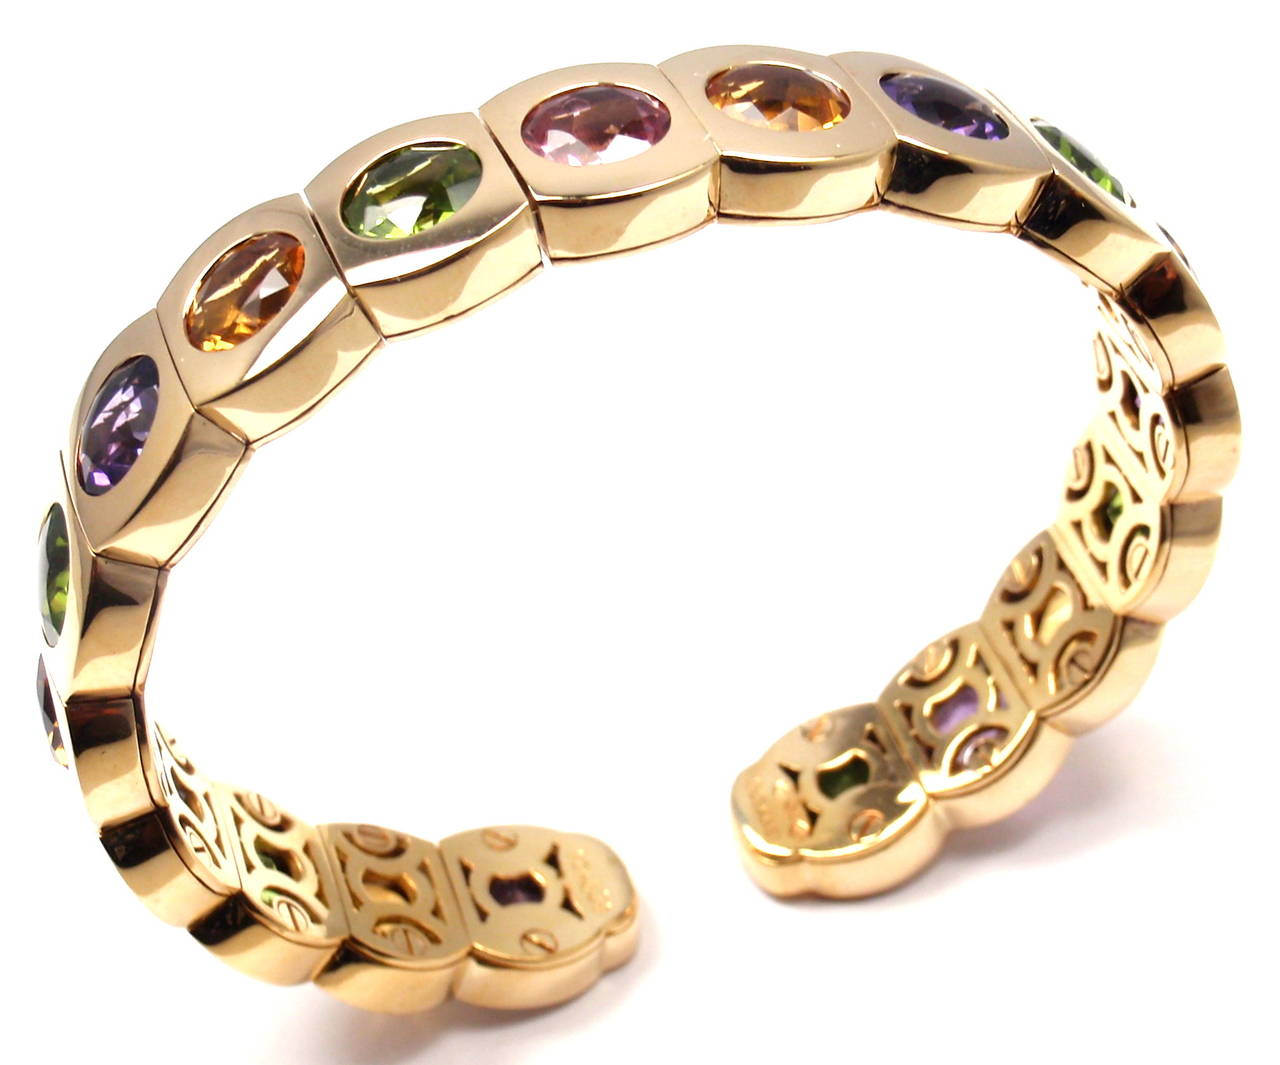 Chanel Multi Color Stone Yellow Gold Cuff Bangle Bracelet 3